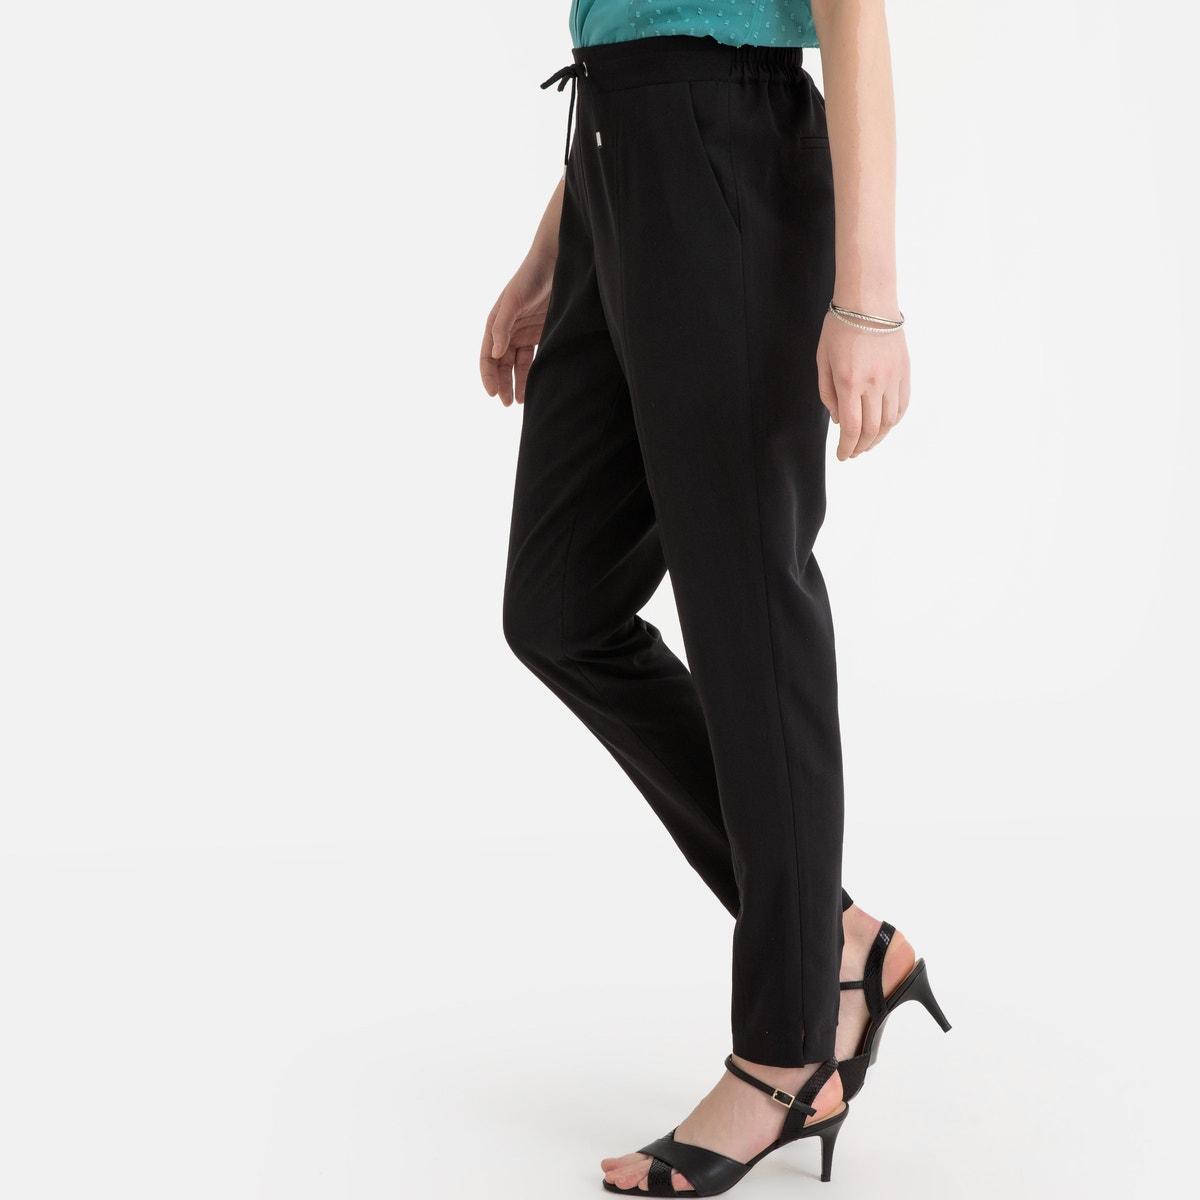 eb5bda904b6 SizePlusOnly | Γυναικεία Ρούχα Μεγάλα Μεγέθη | La Redoute ...